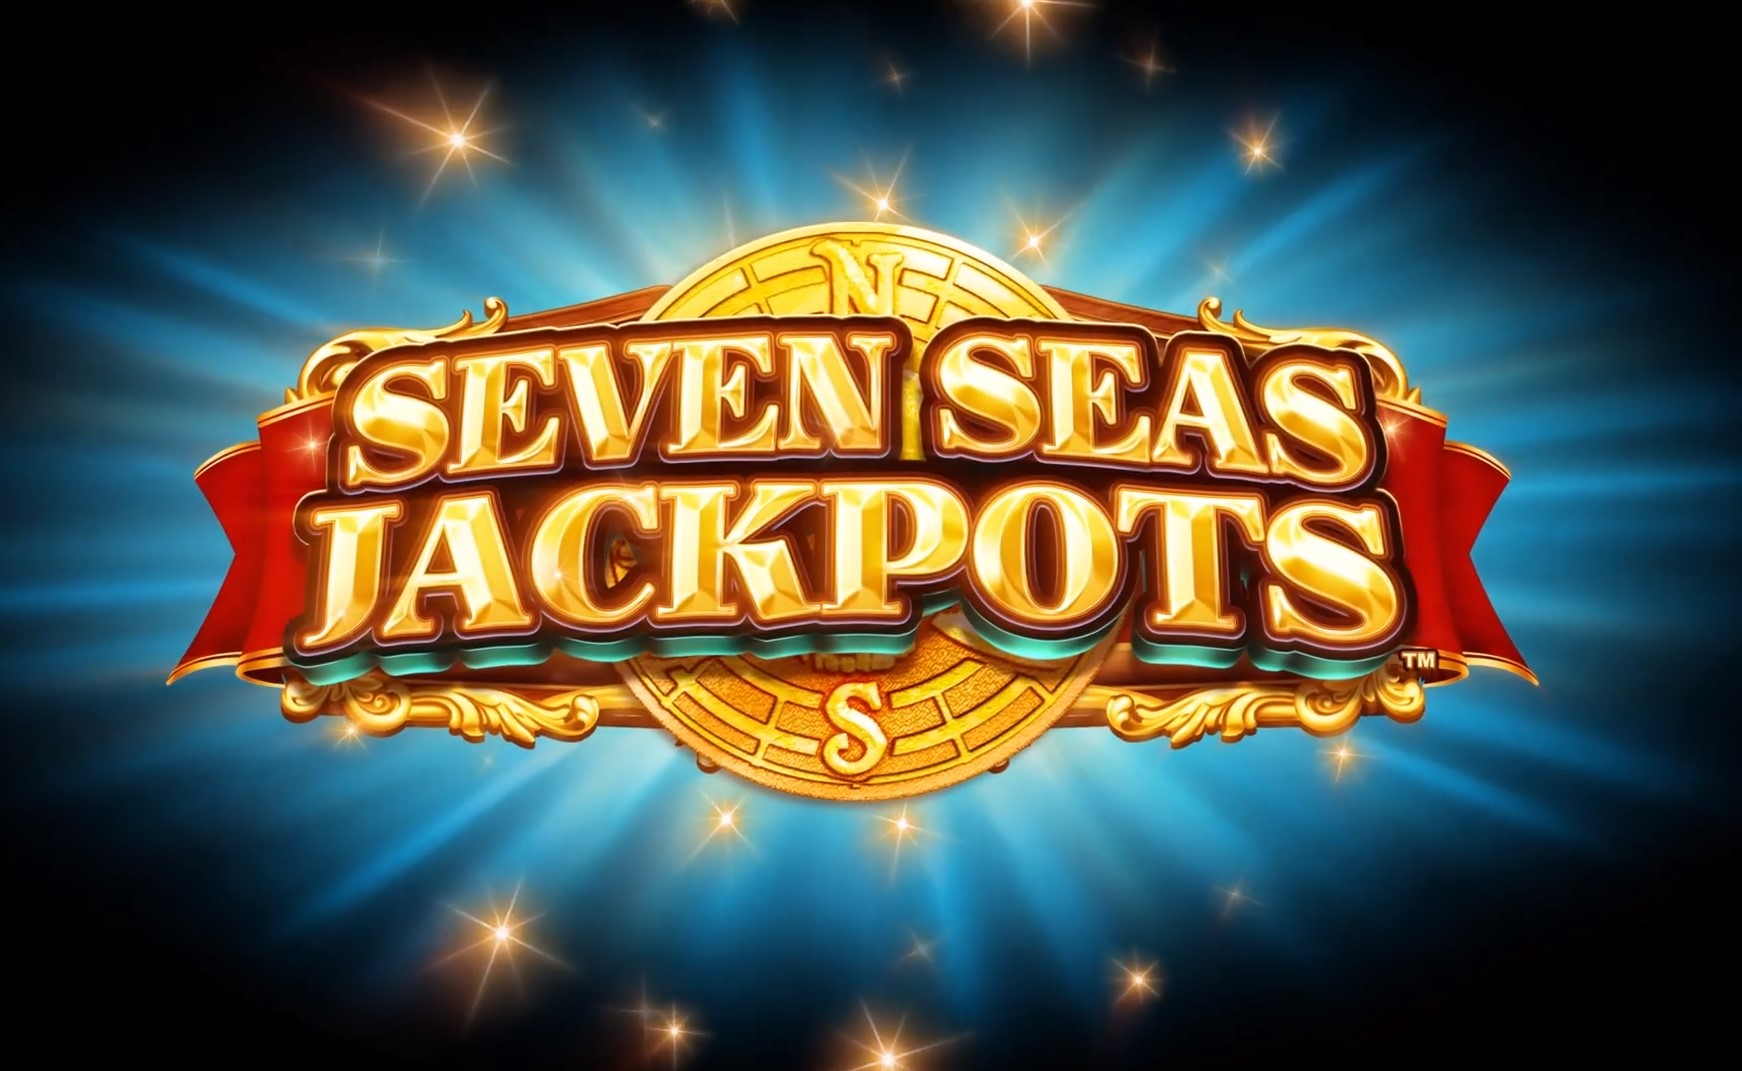 Play Seven Seas Jackpots